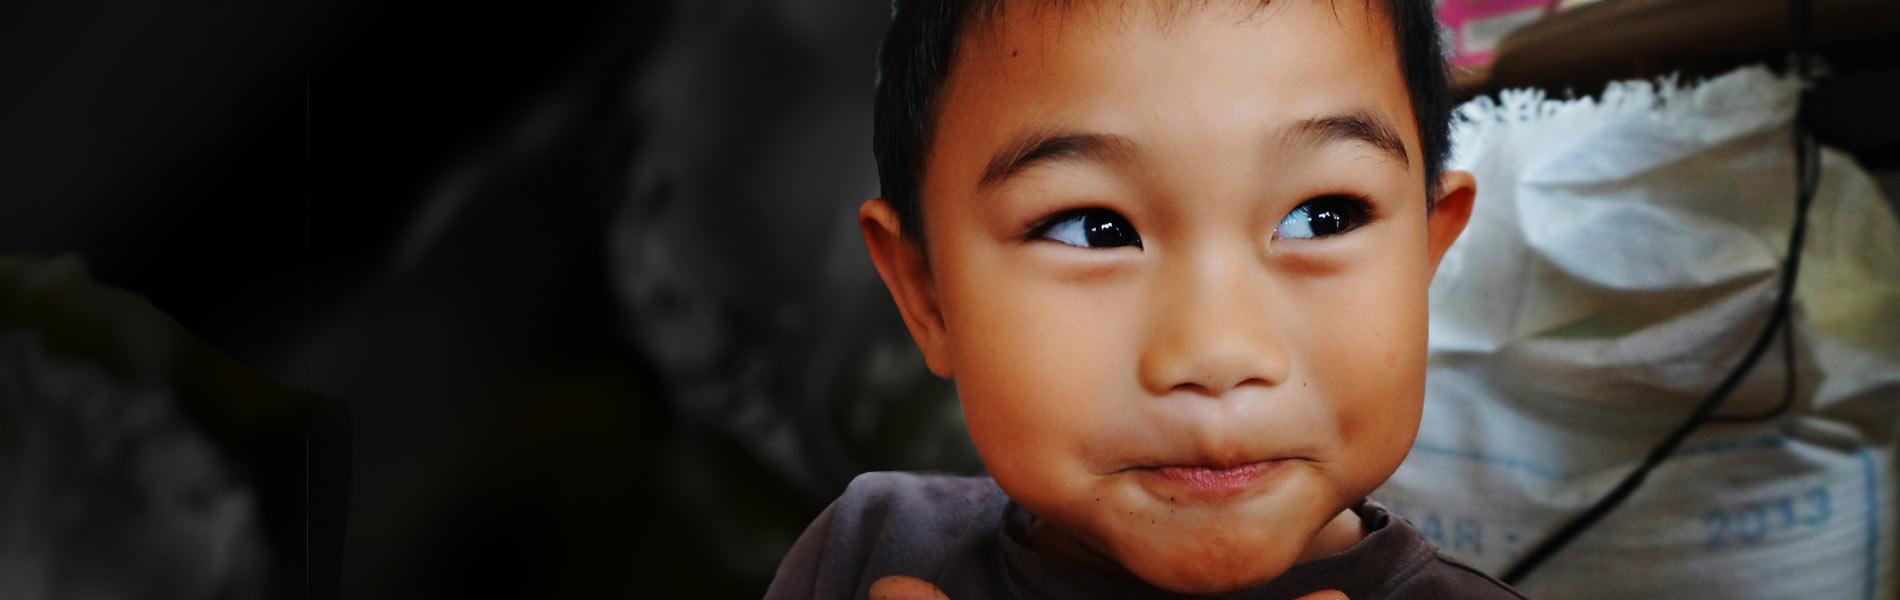 """A Bag of Milk Go Ballistic"" is Changzhou's charity walk to benefit underprivileged children"